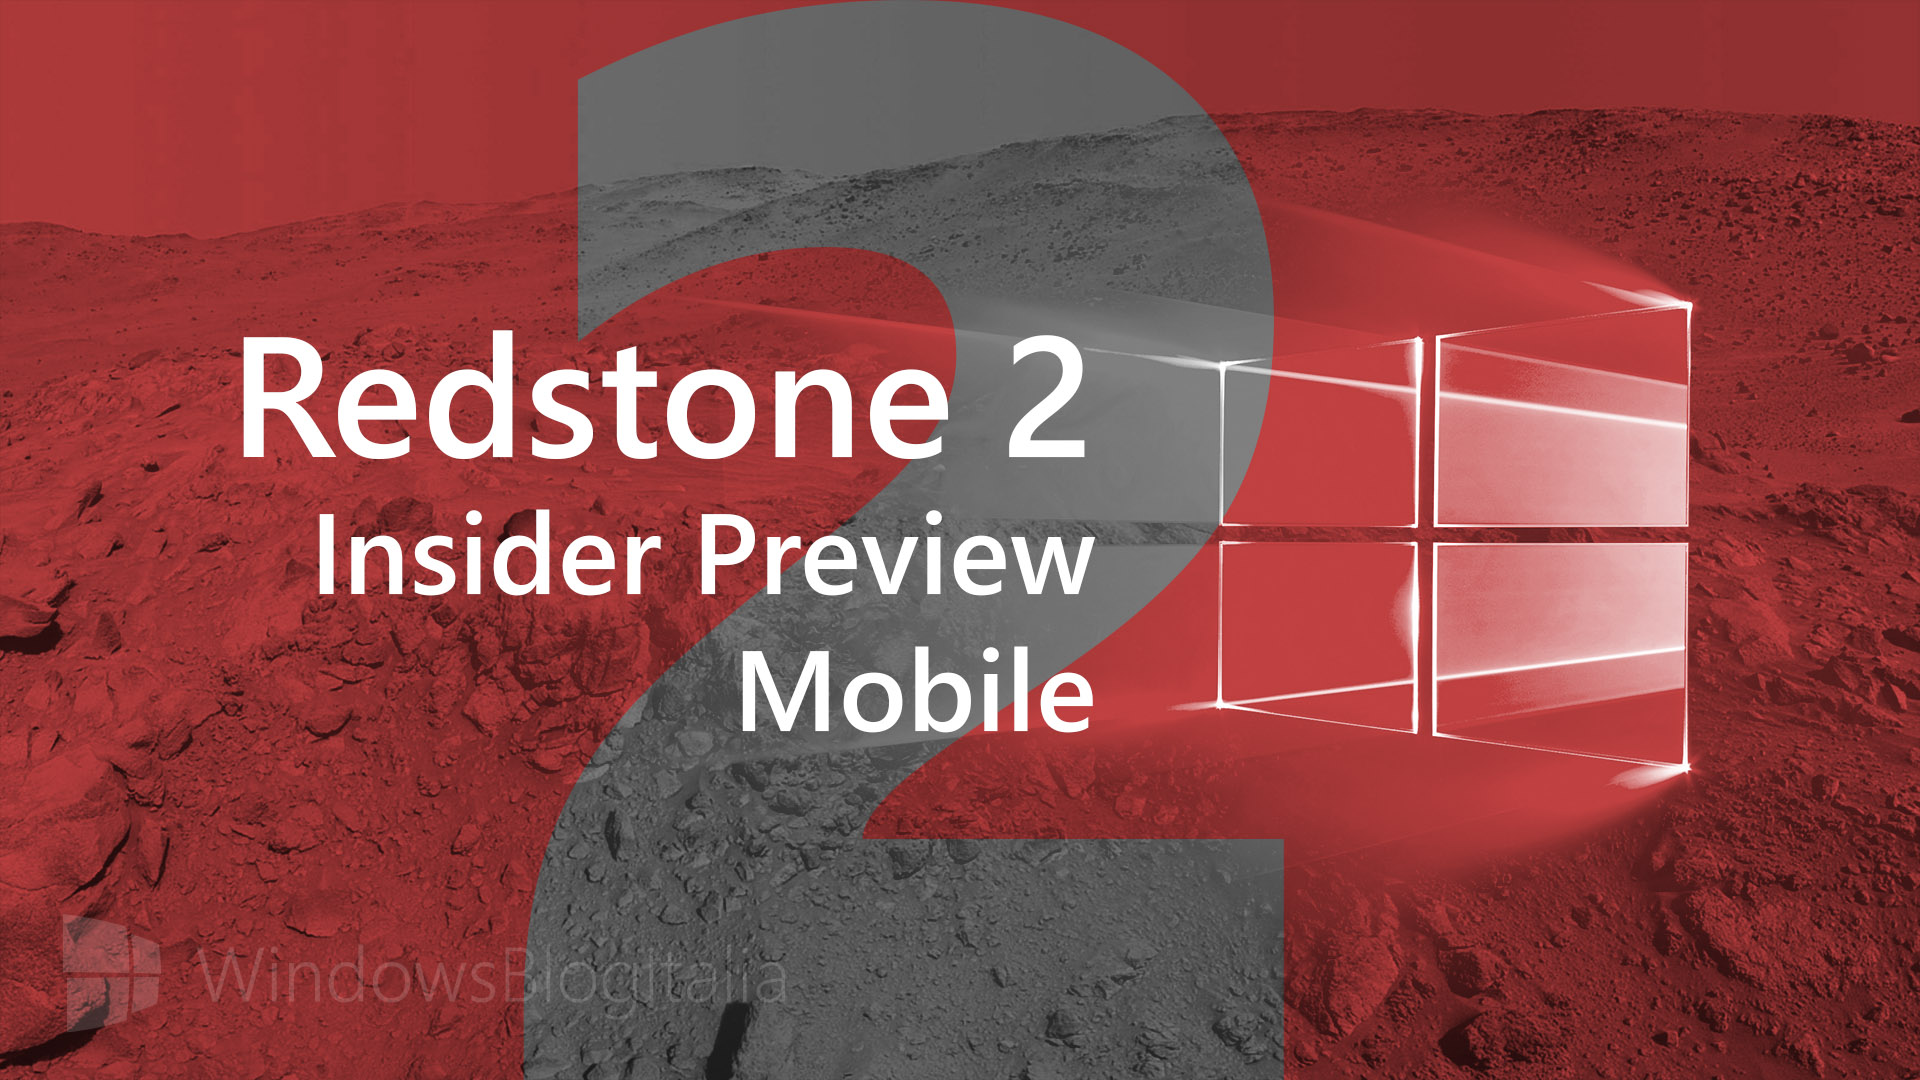 Redstone 2 mobile